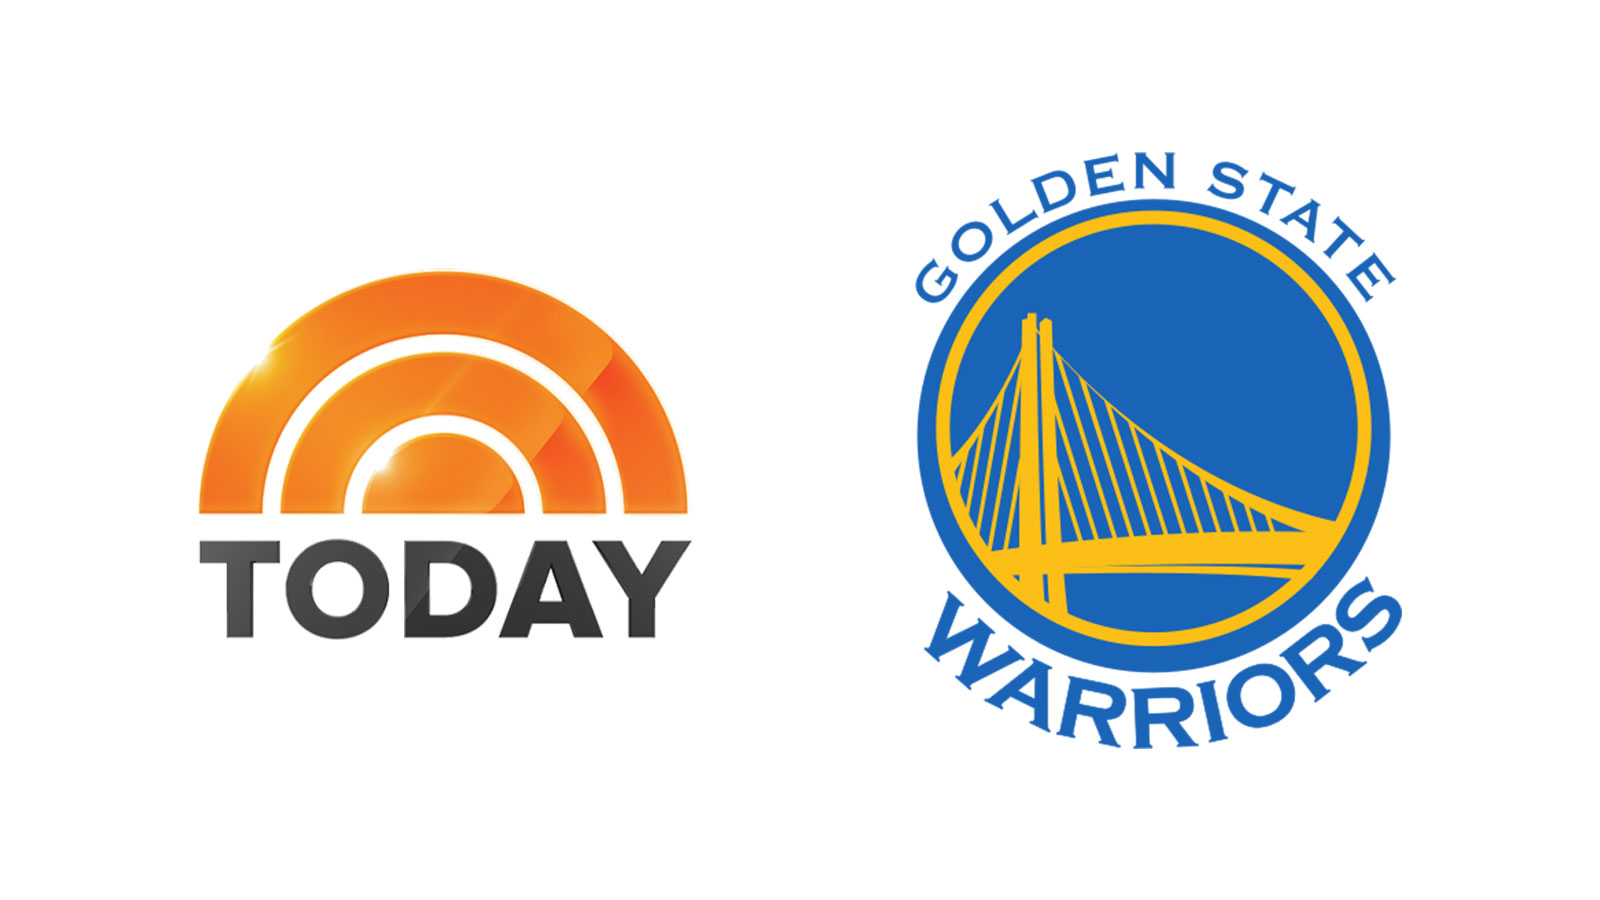 Today show Logos.